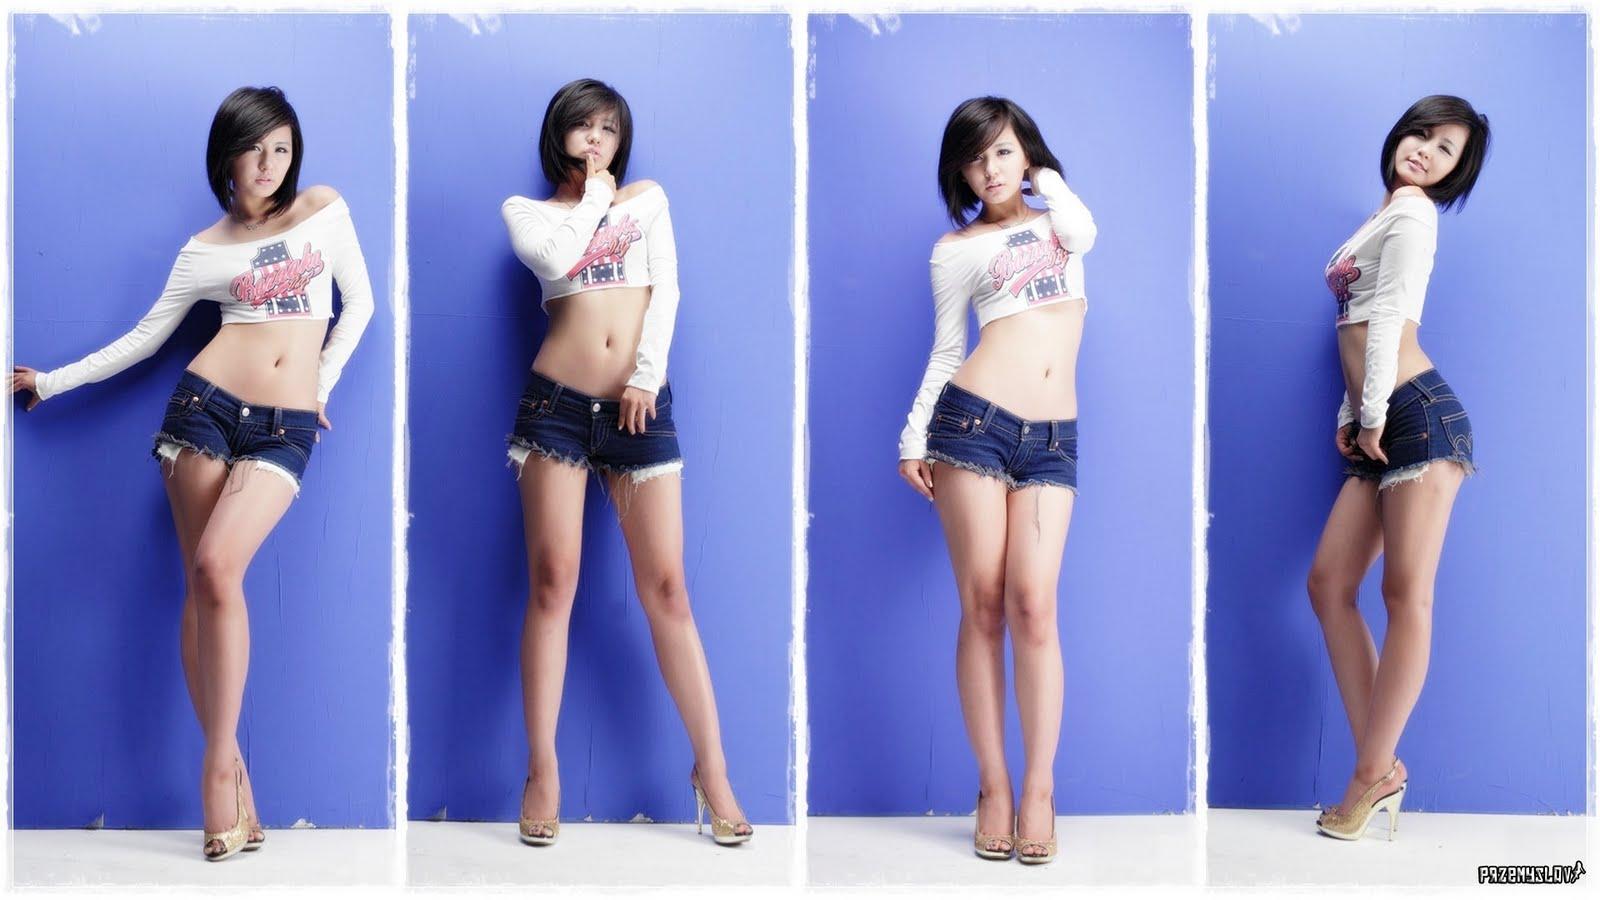 Nina hartley jamie gillis hot girls wallpaper